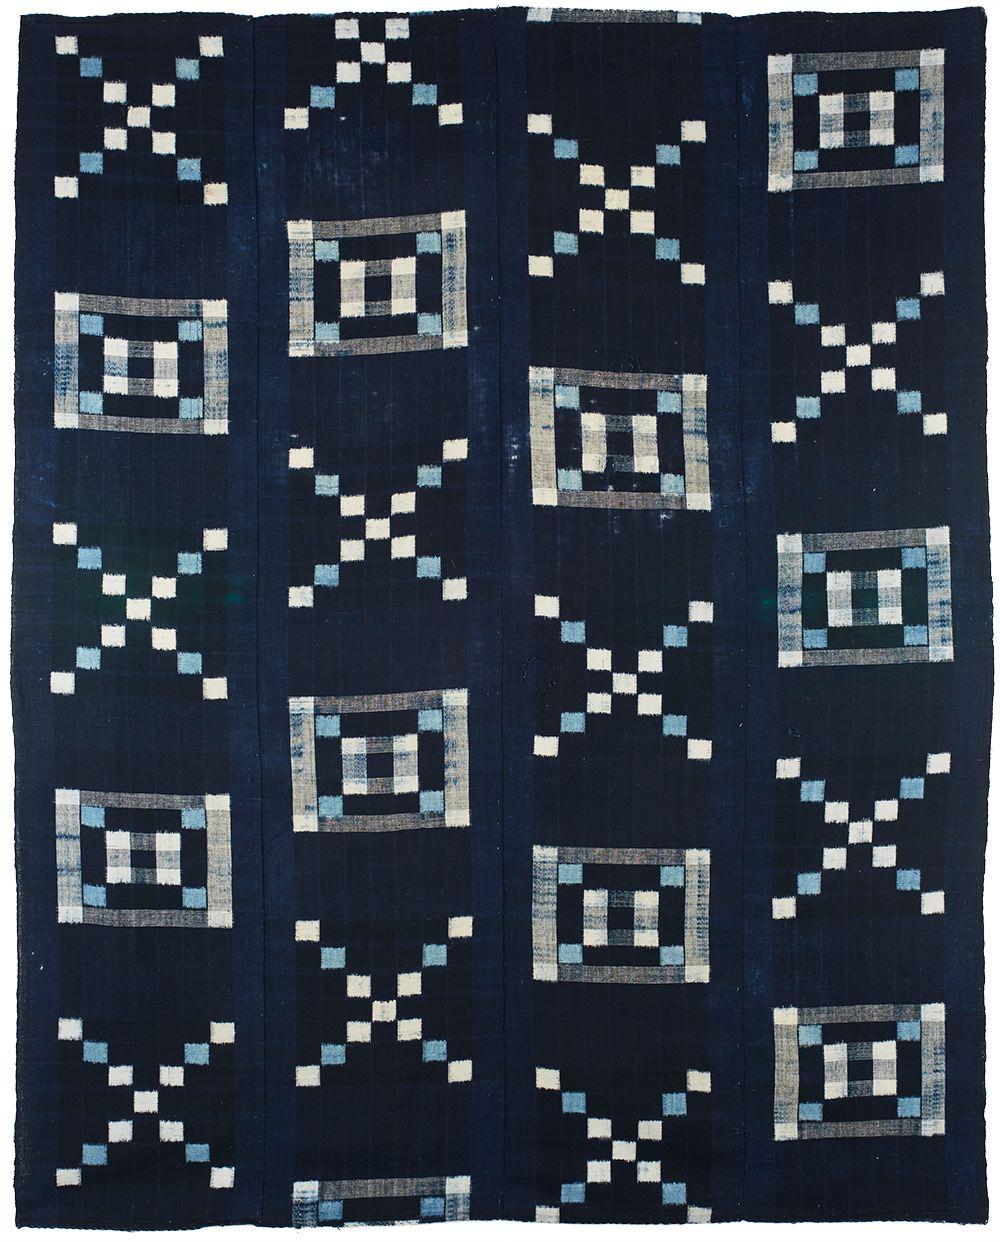 Japanese Textiles    Futon Cover  , 20th century Indigo dye/cotton 62.5 x 50 in(158.8 x 127.0 cm) JTex 71